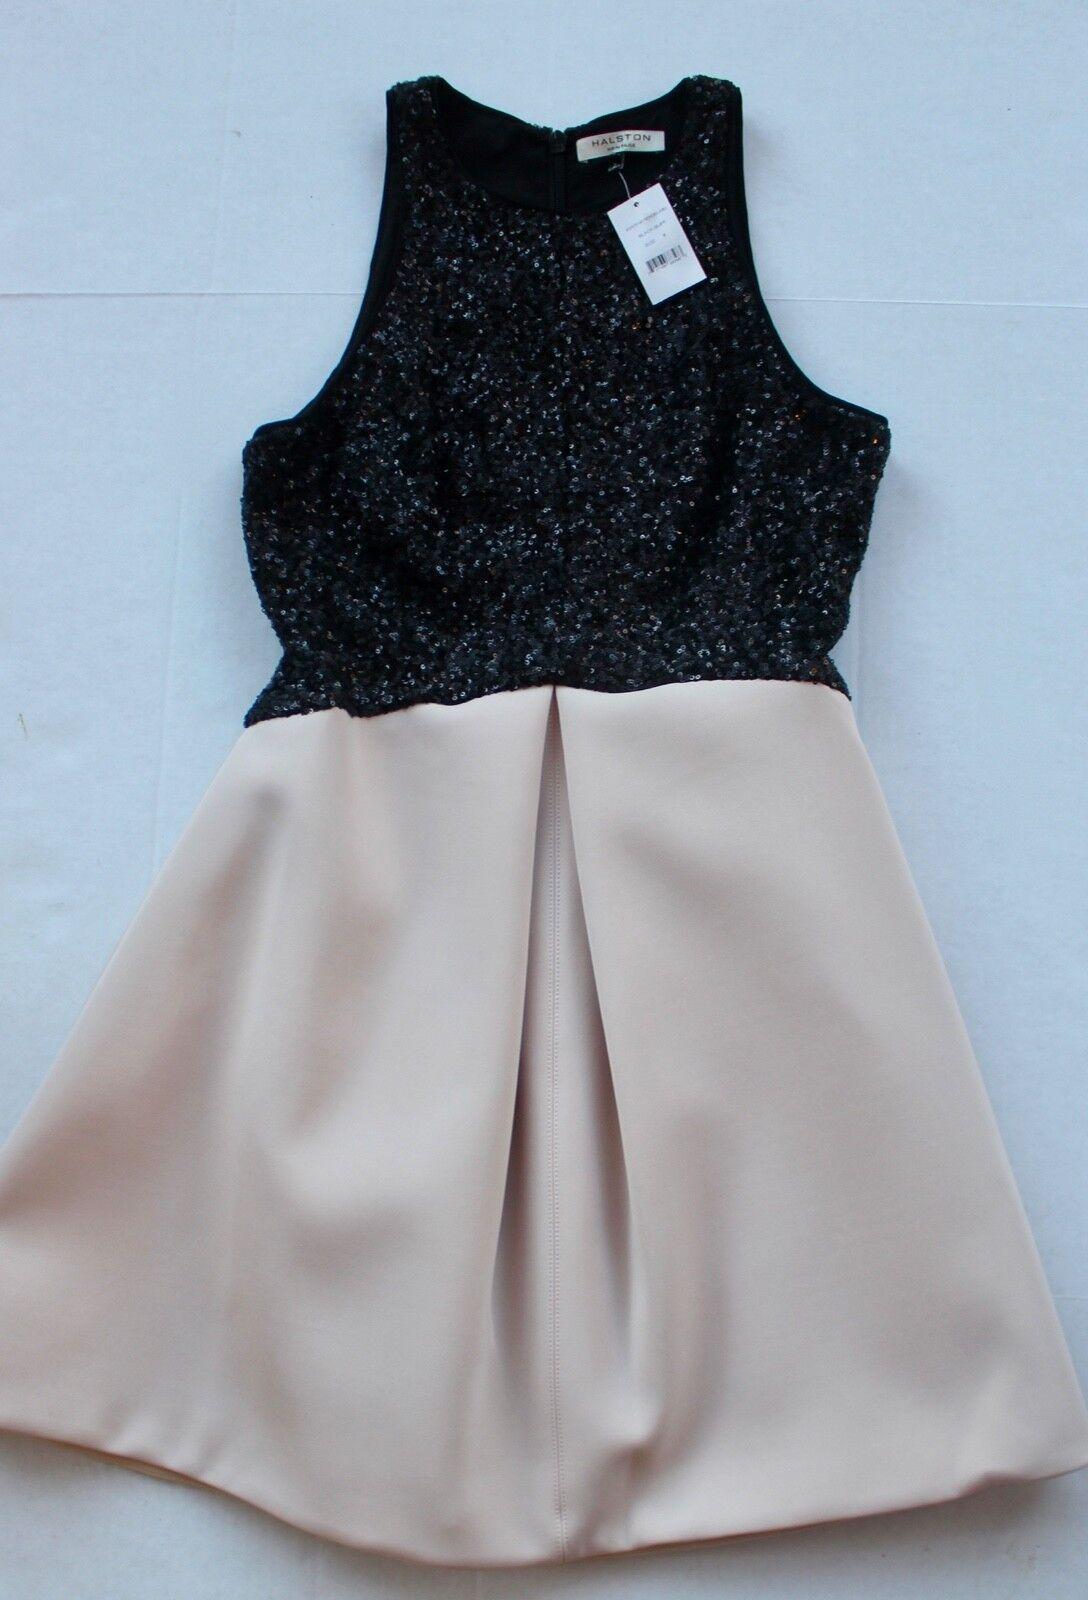 495 NWT  HALSTON HALSTON HALSTON HERITAGE  size 8  Two tone Sequin Fit & Flare Dress 127260